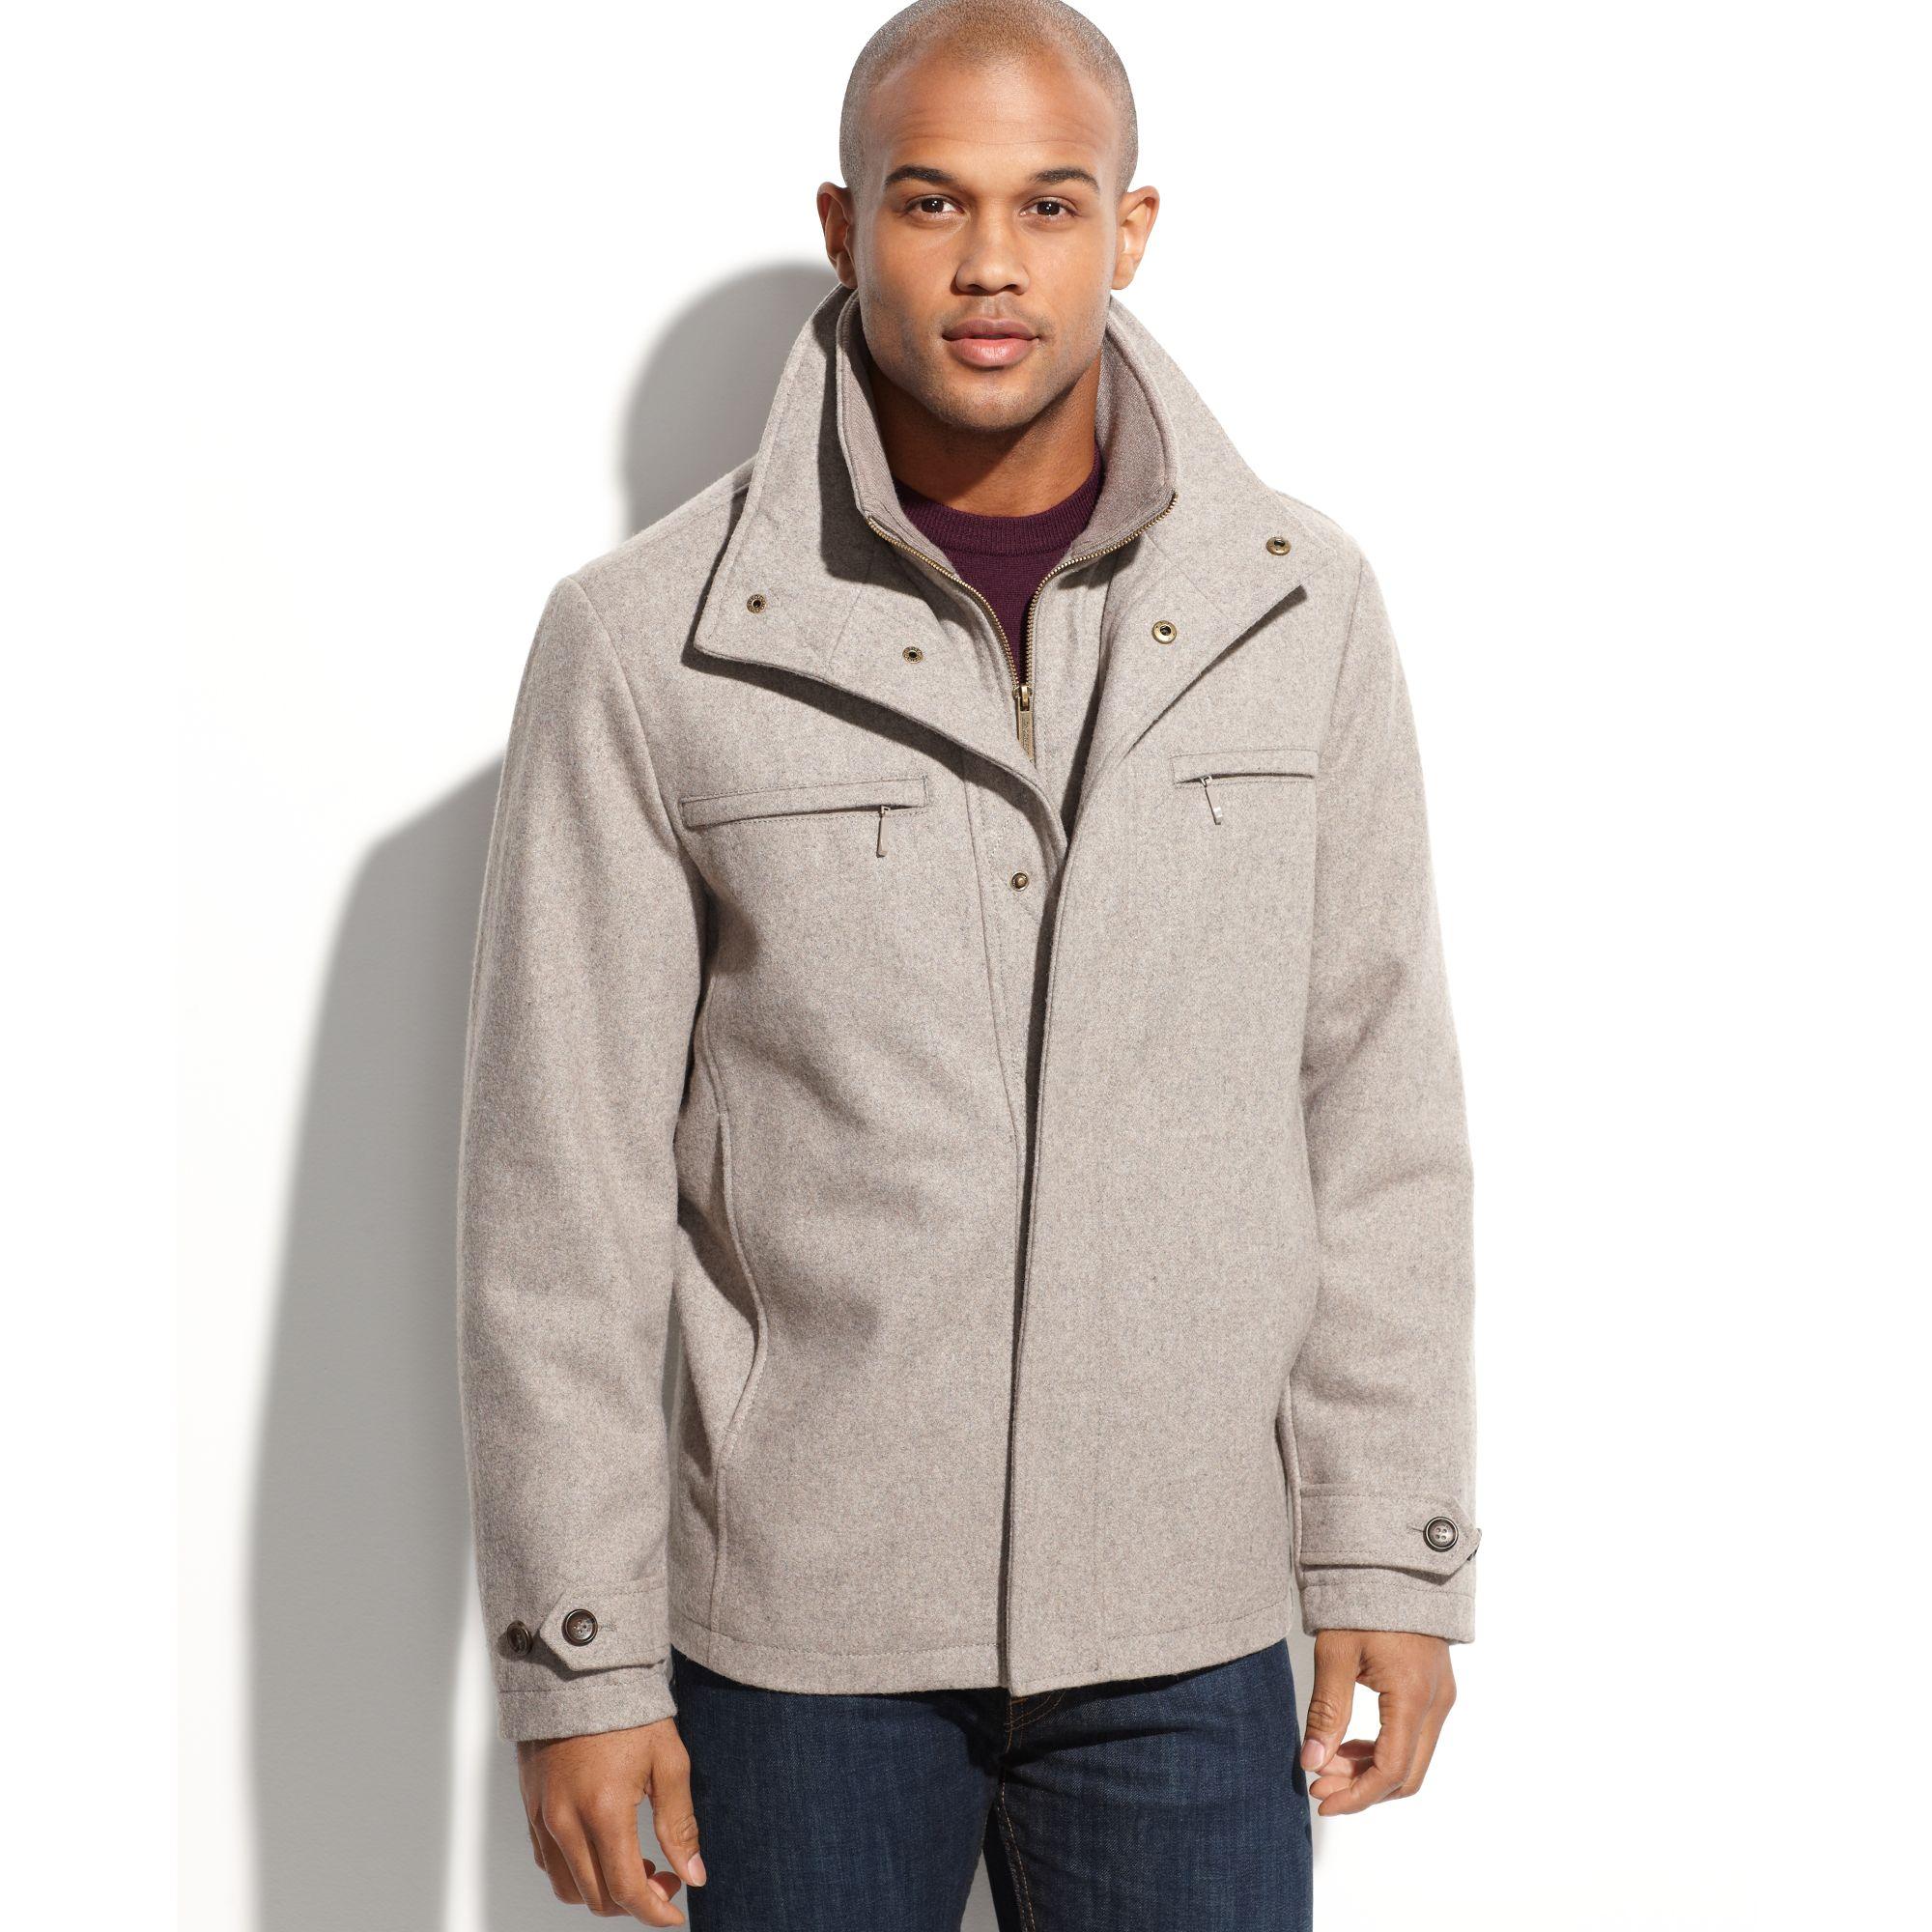 Jones New York Jacket